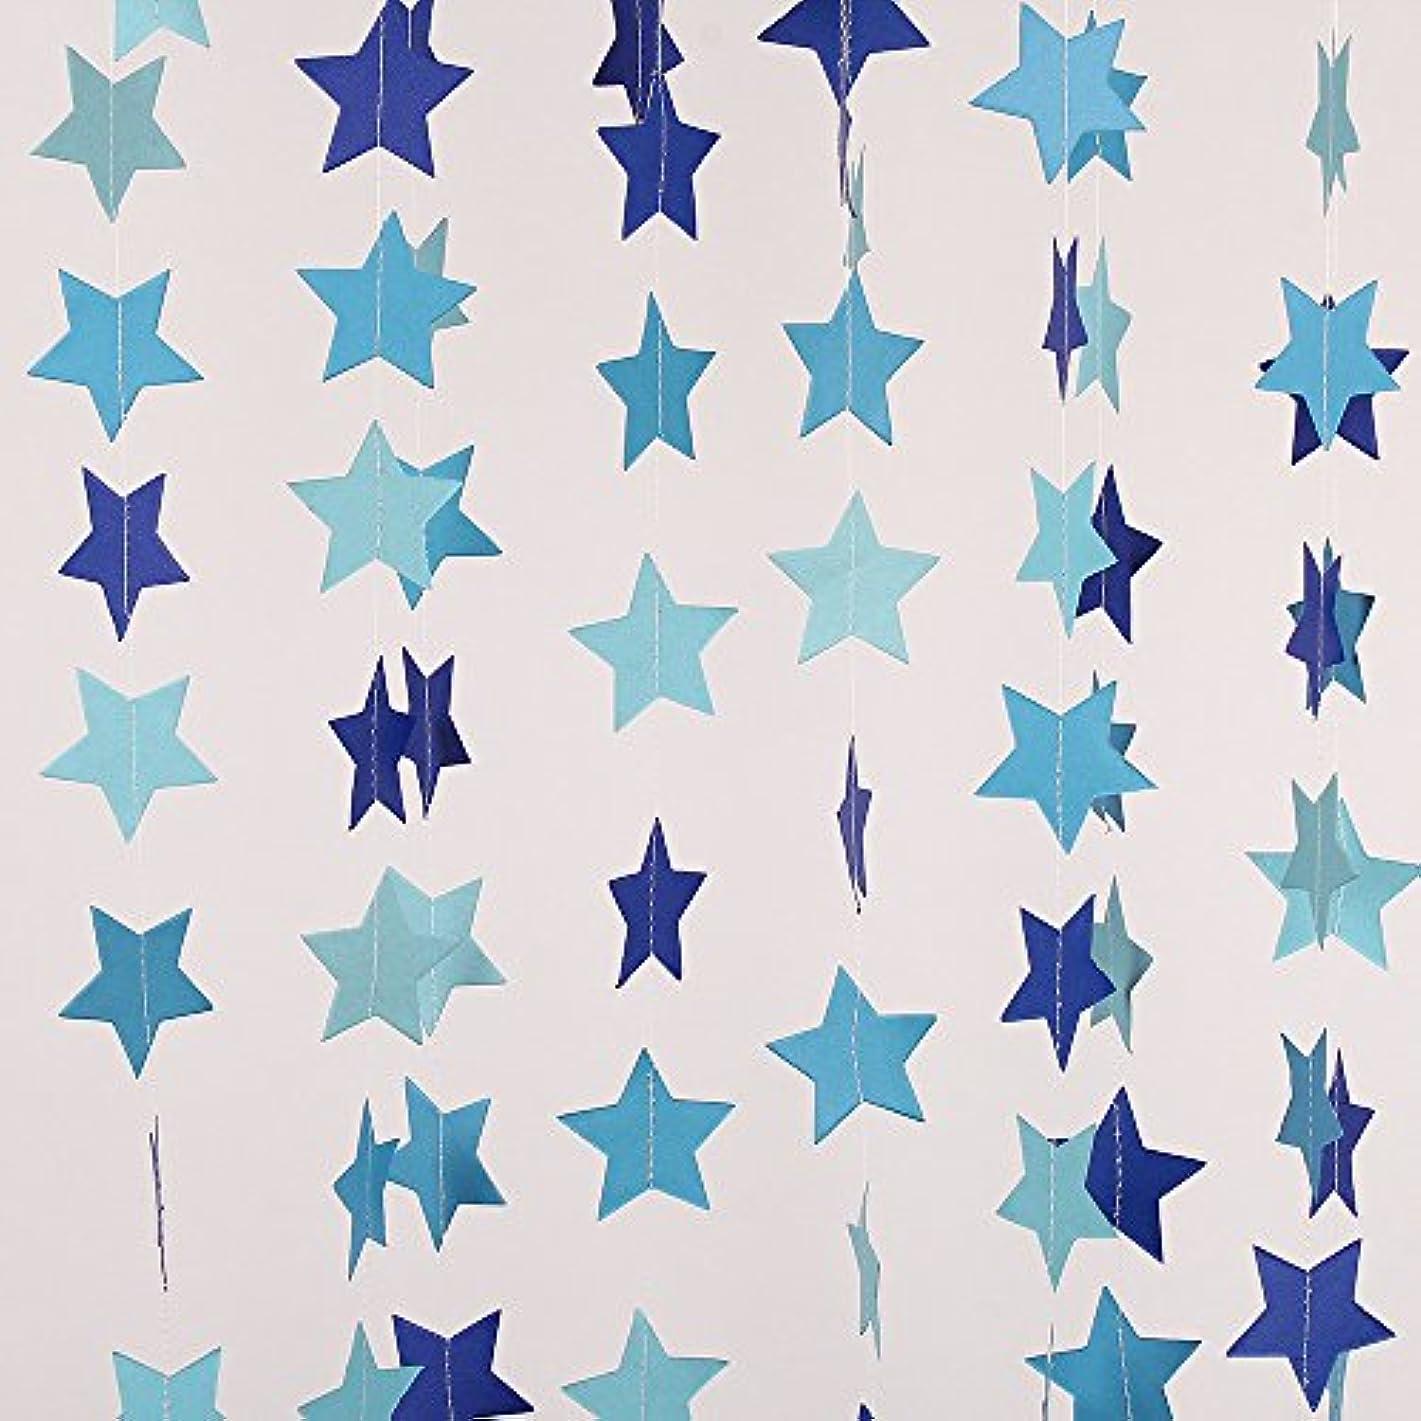 ZOOYOO Paper Star Garland Hanging Decor 2 inch,9.8-feet 2pc Light Blue Deep Blue Sky Blue